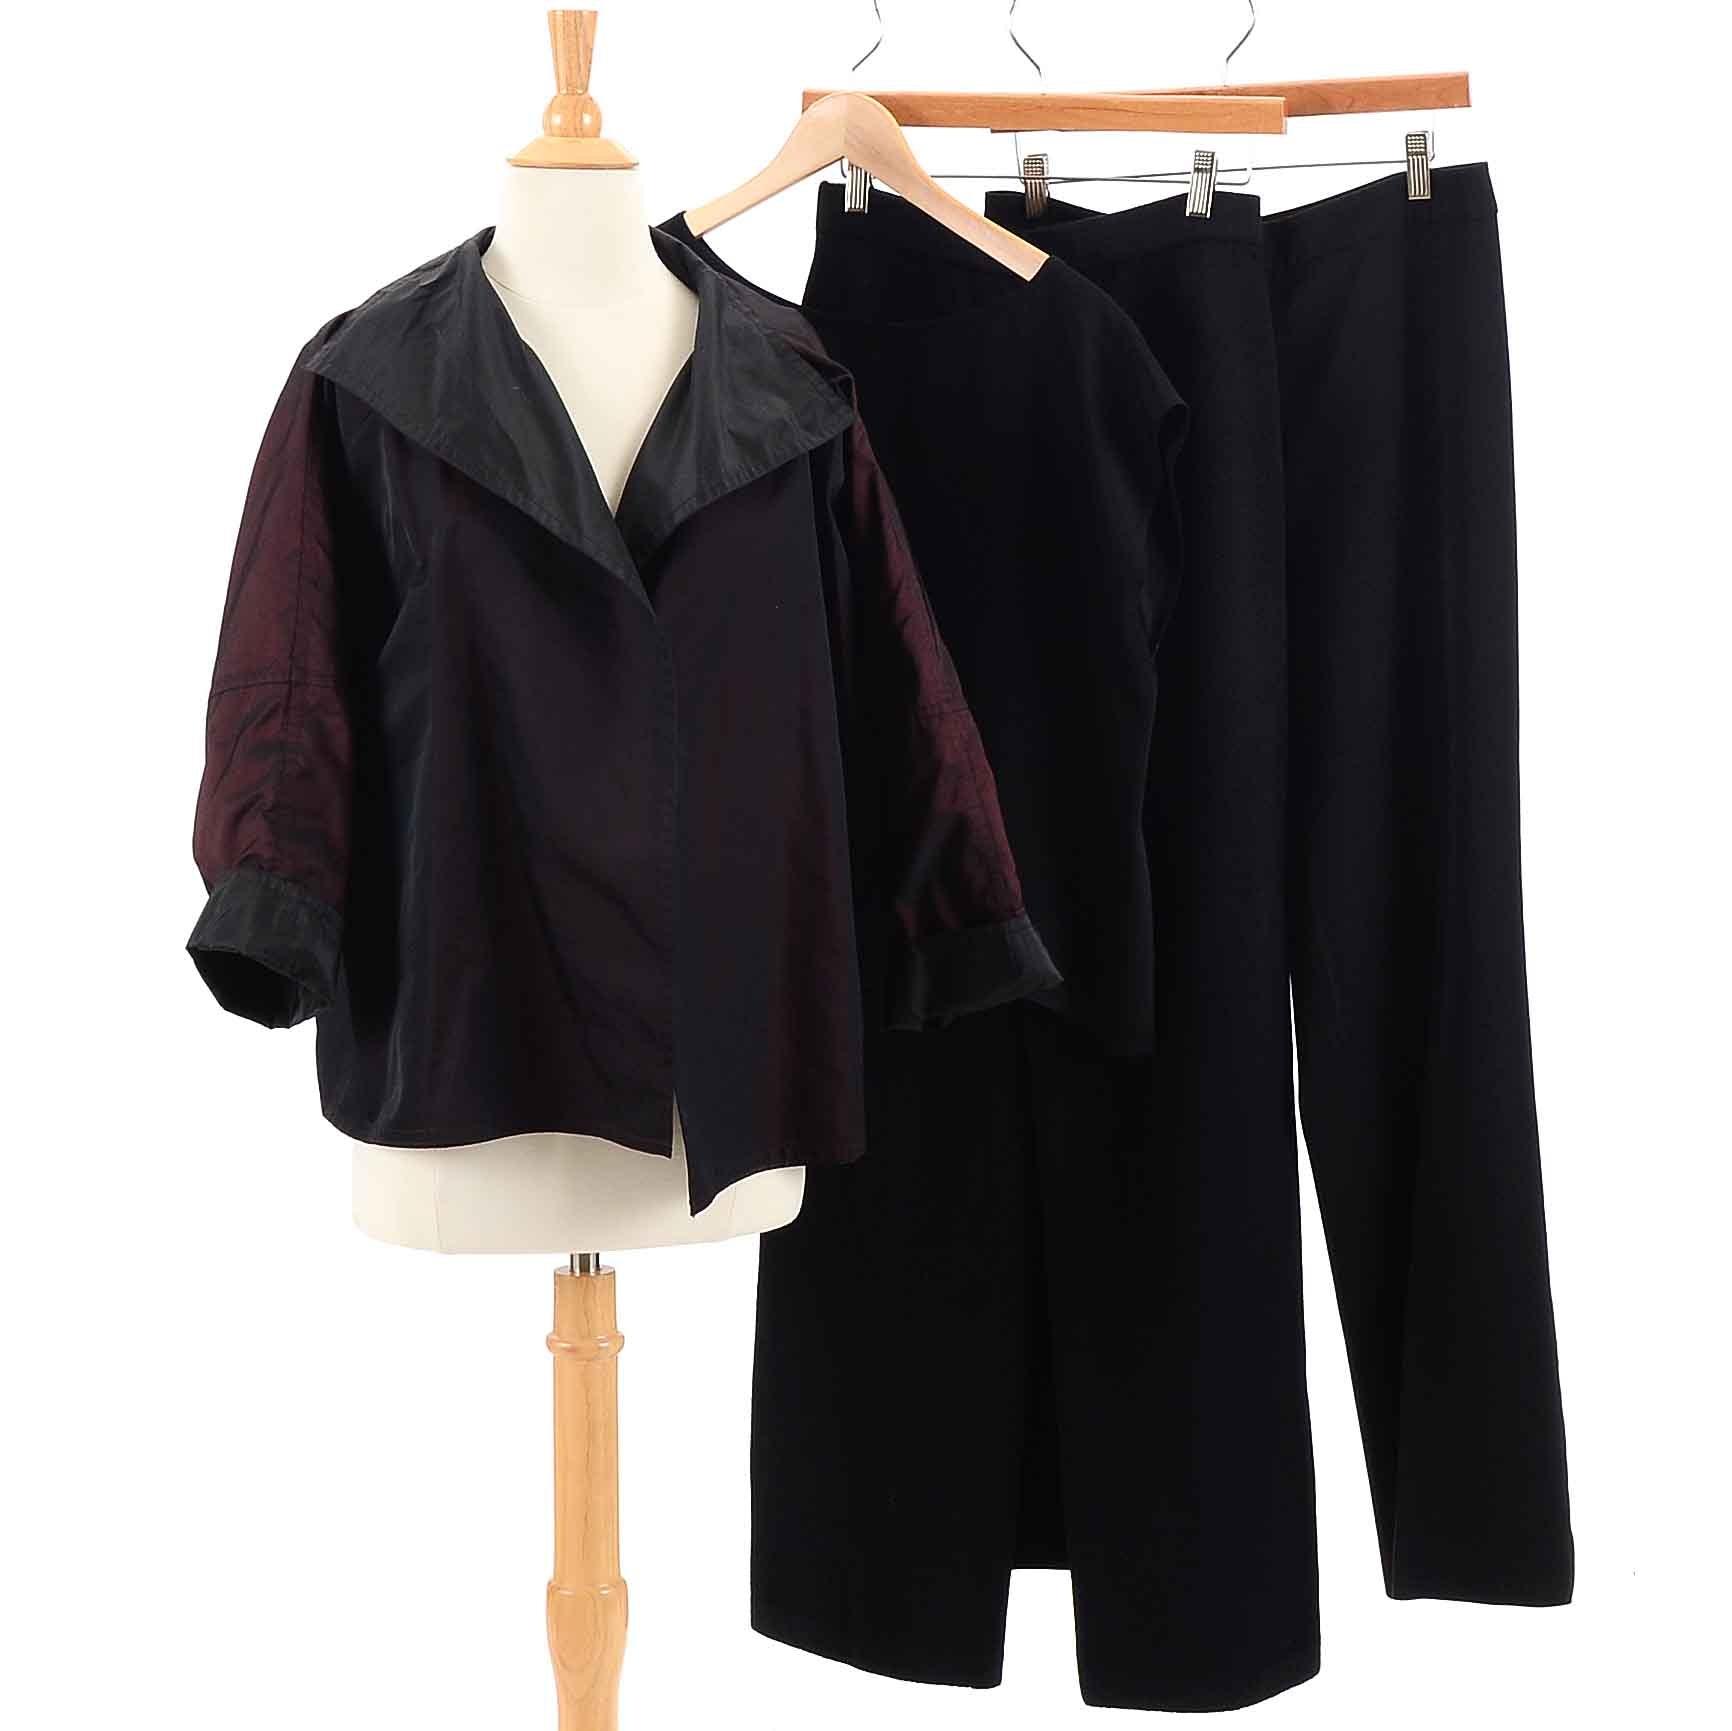 St. John Pants, Zoran Shell and Reversible Jacket